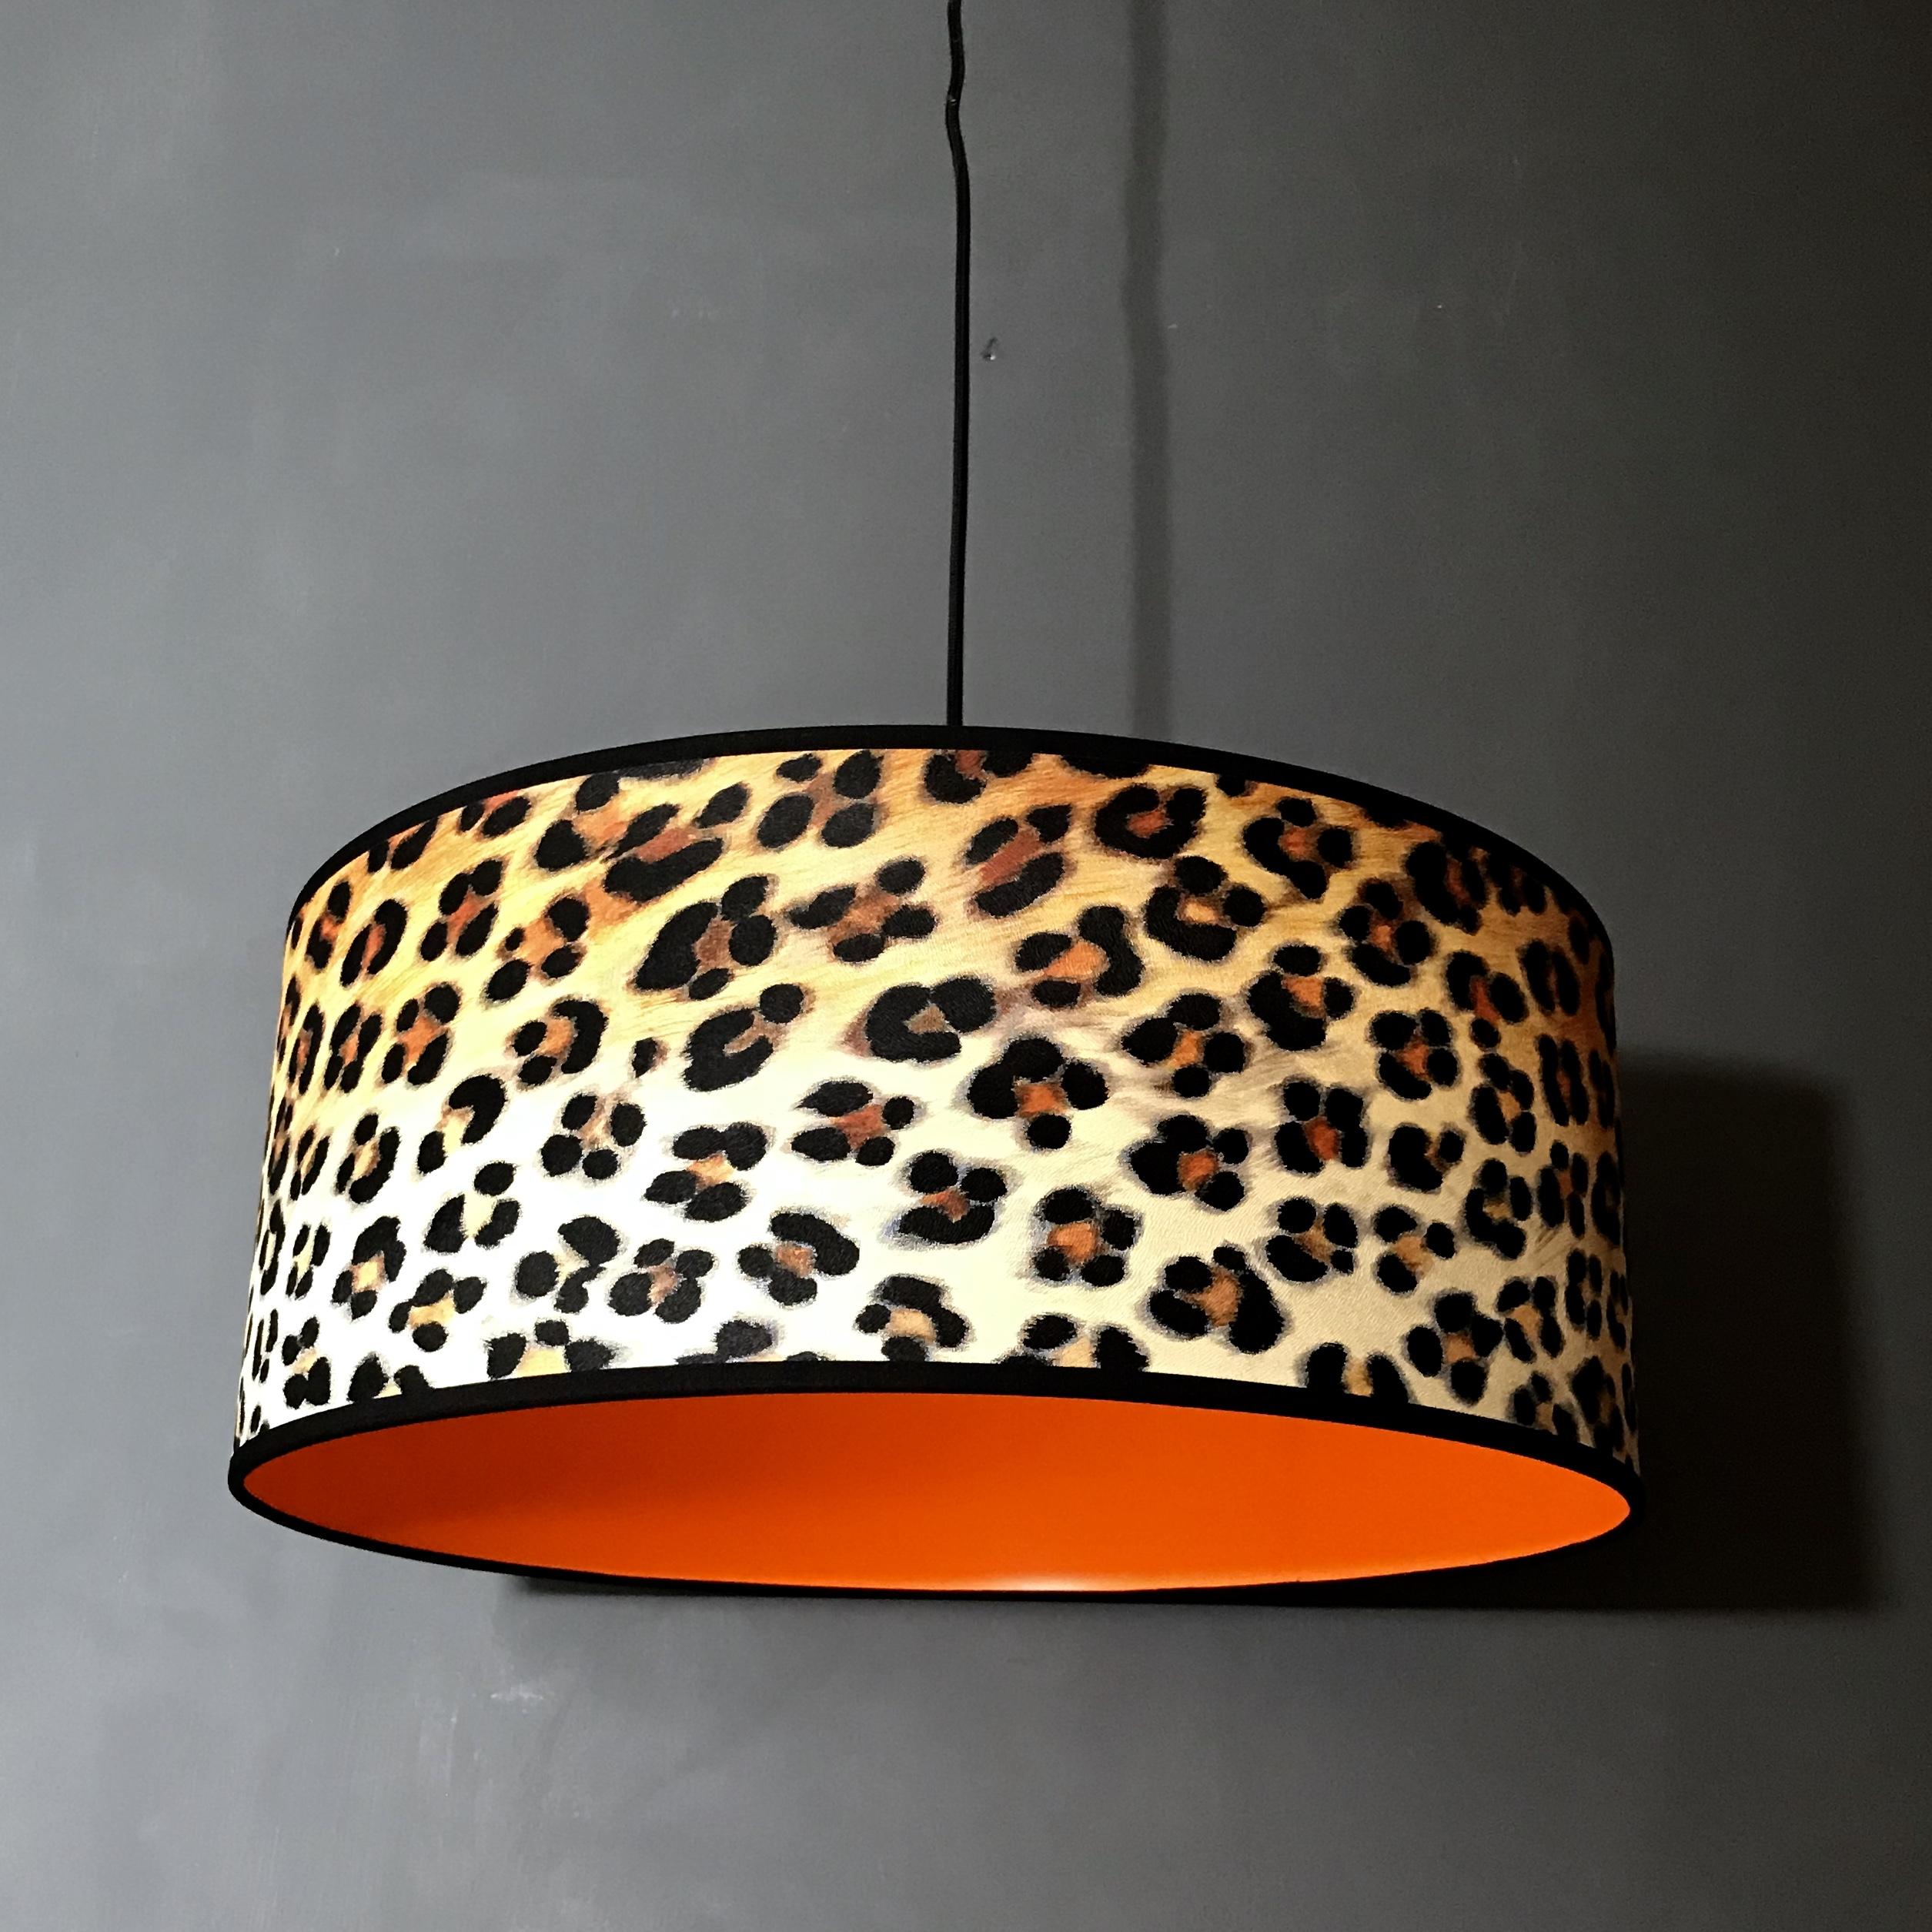 Wild Leopard Print Wallpaper Lampshade With Neon Orange